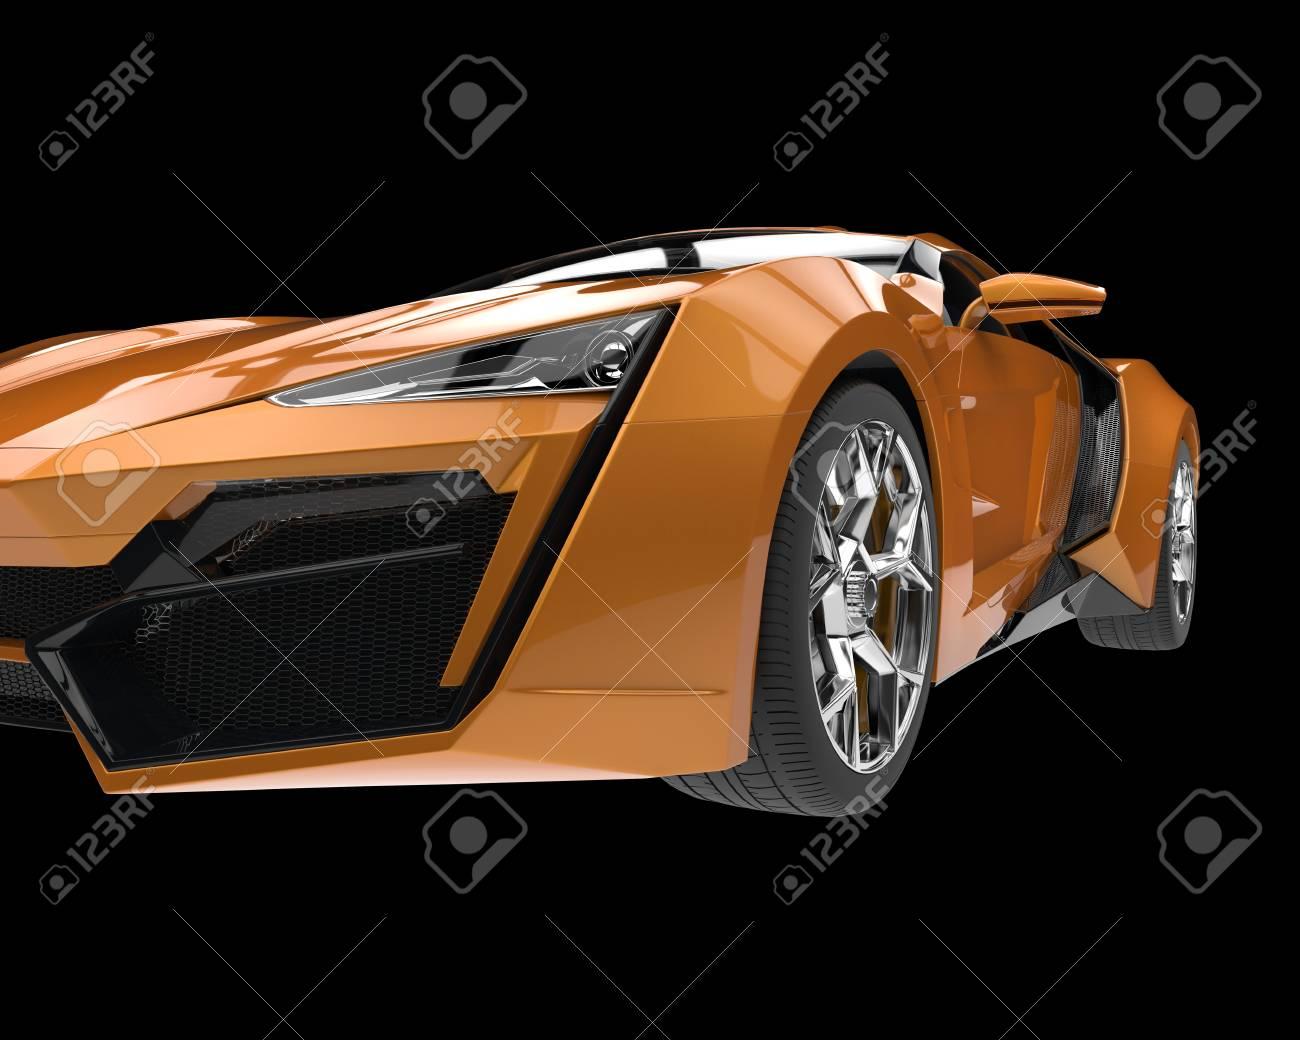 Sports Car Closeup Orange Metallic Paint